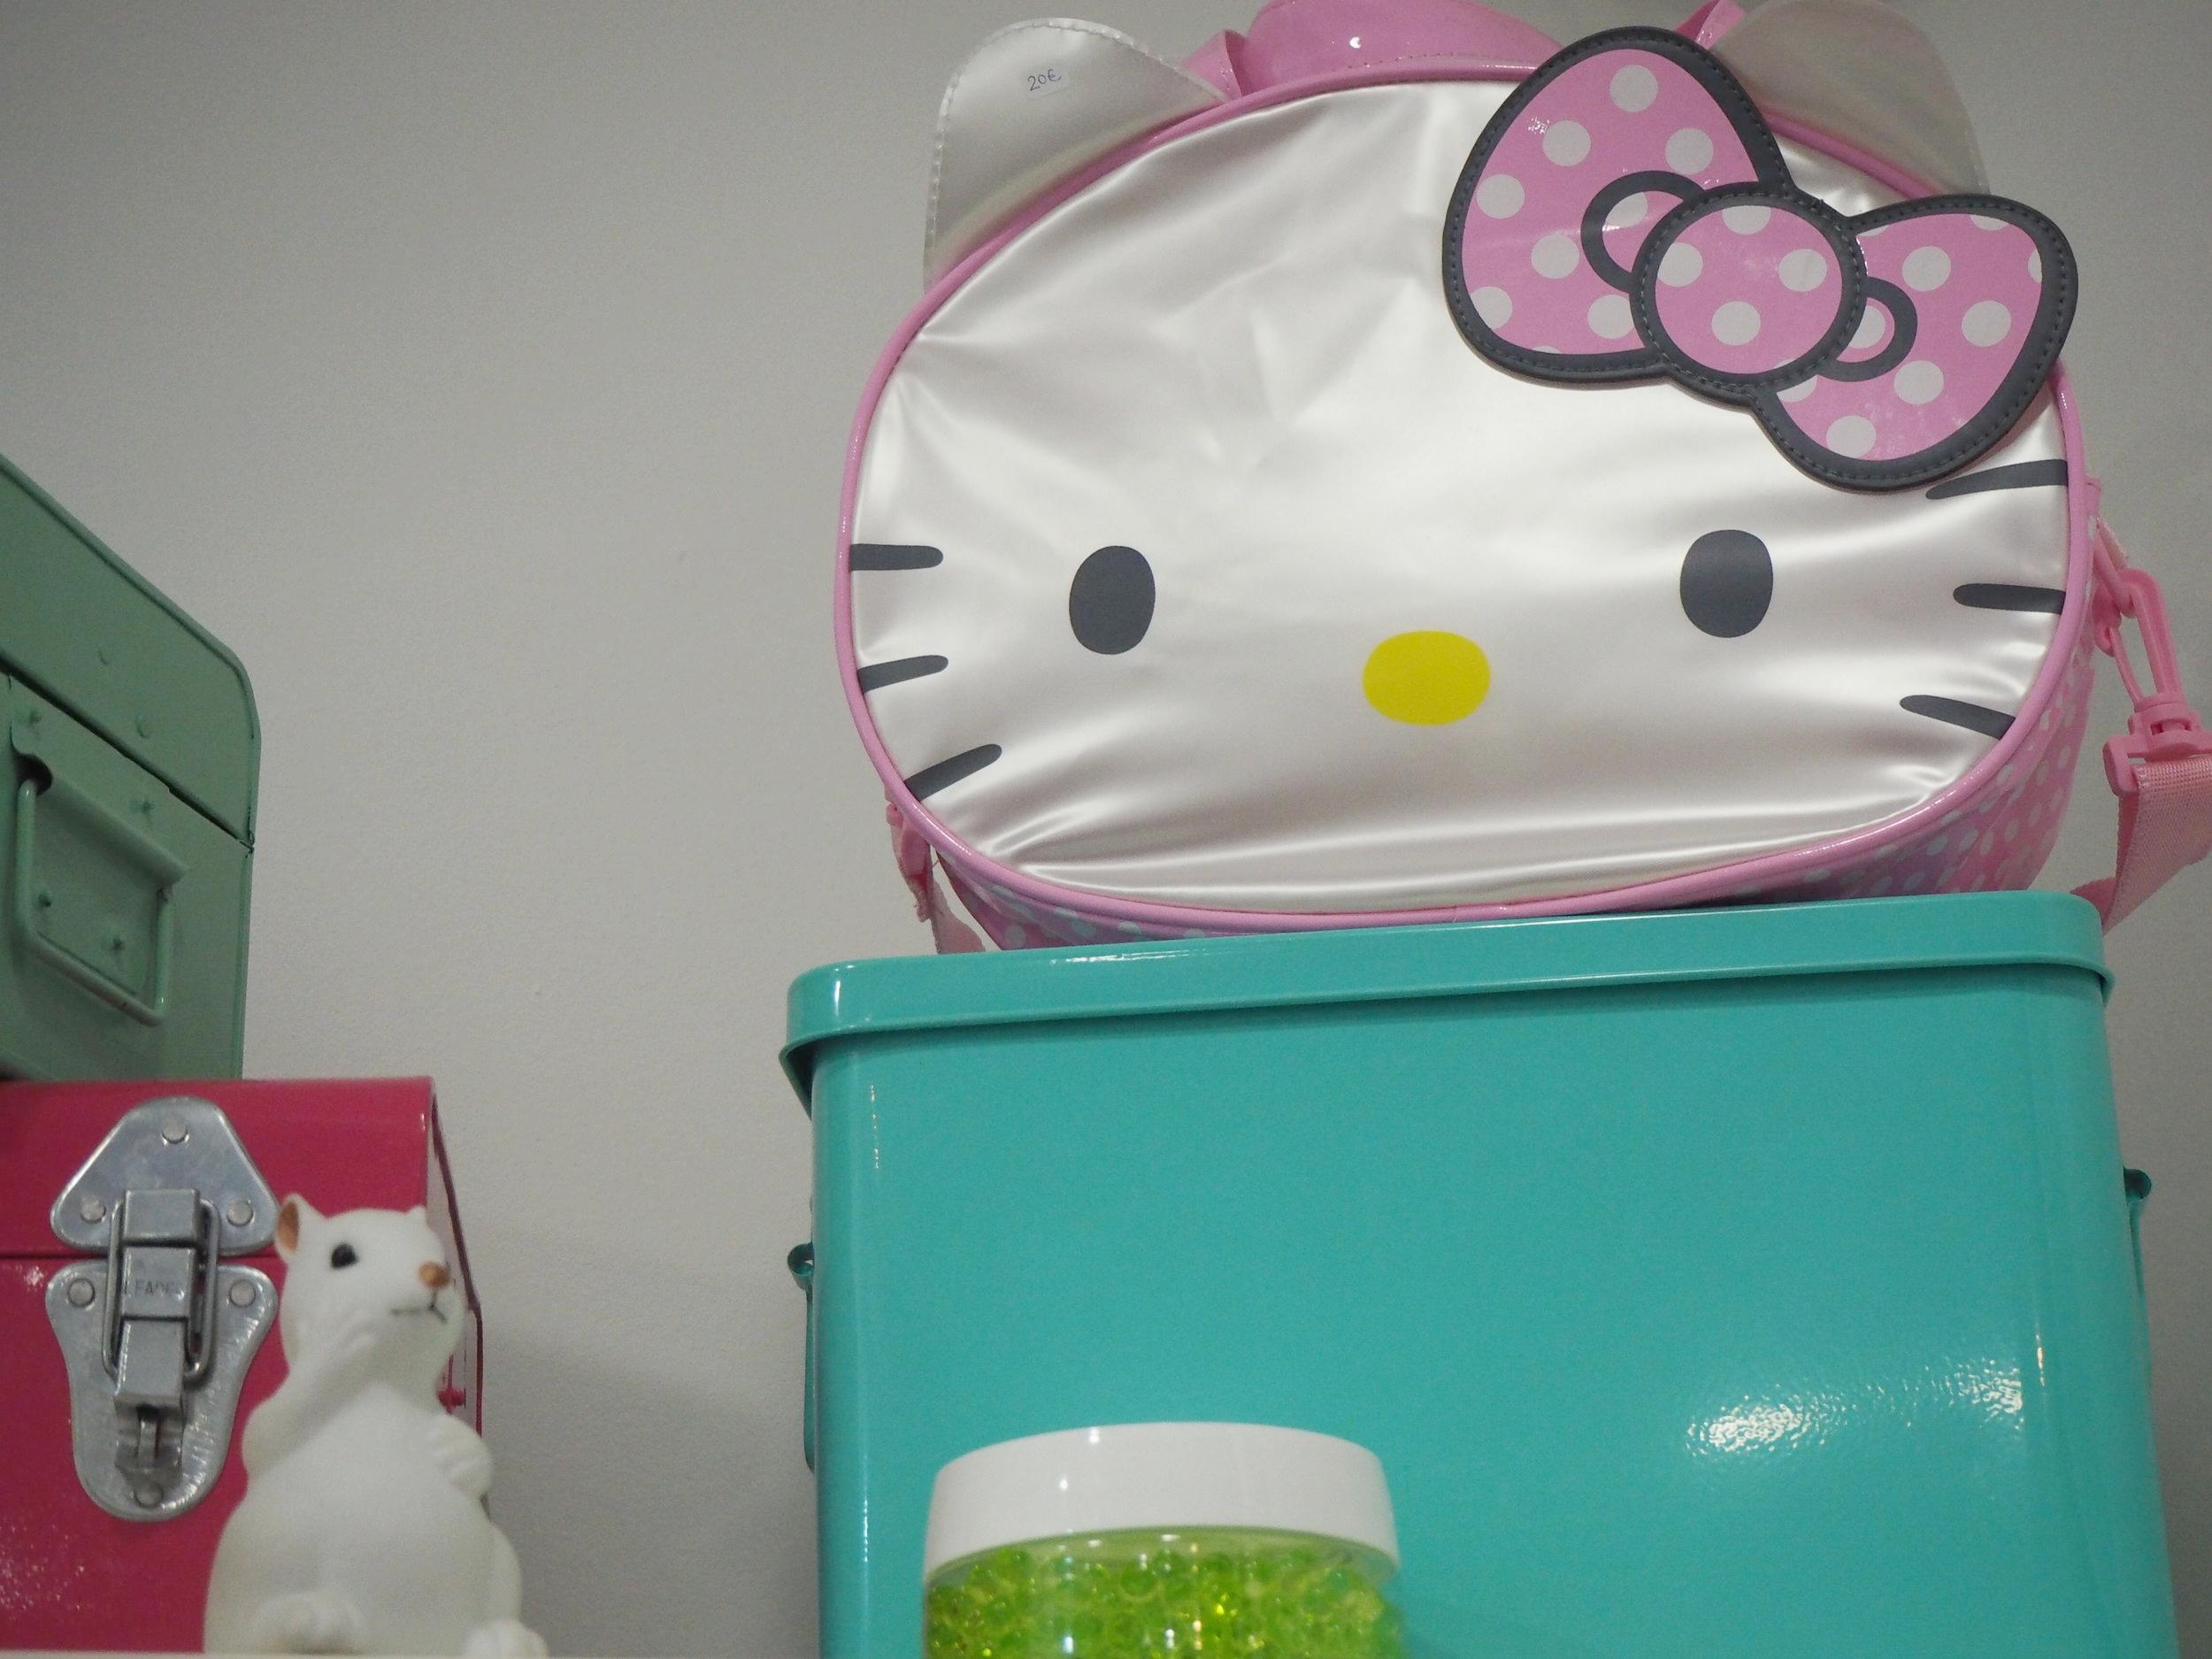 ropa-japonesa-madrid-hello-kitty.JPG